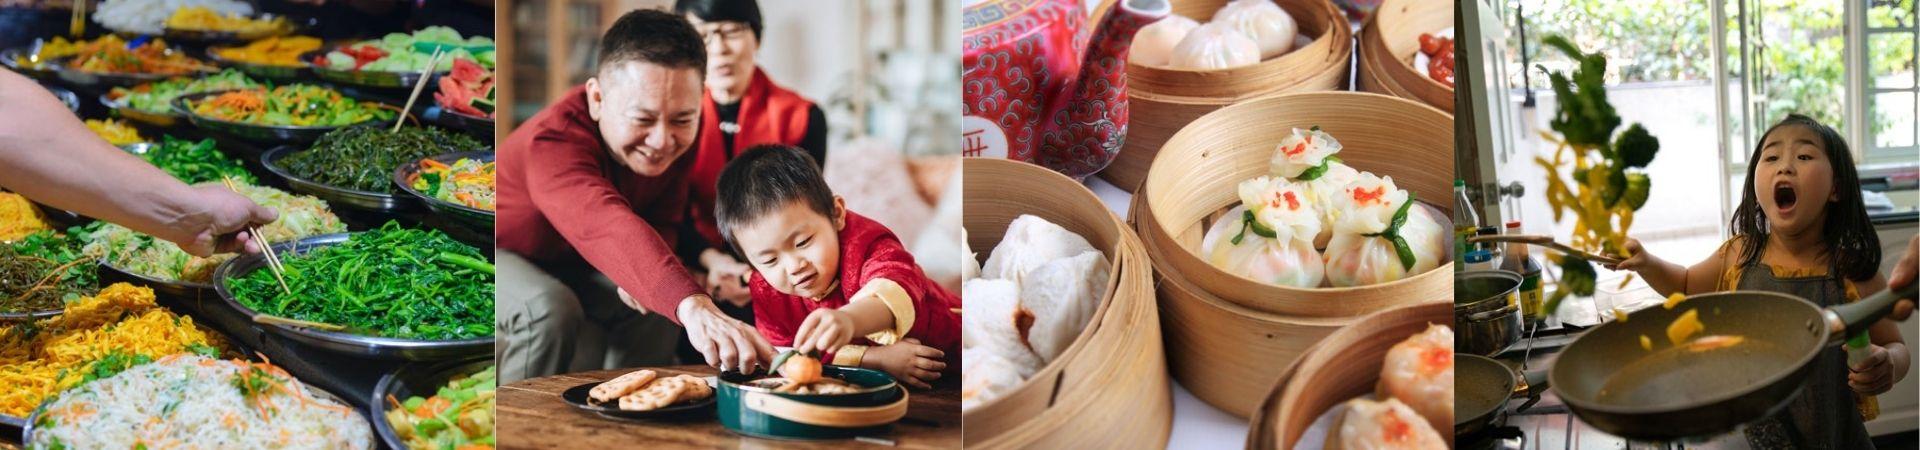 China's food future